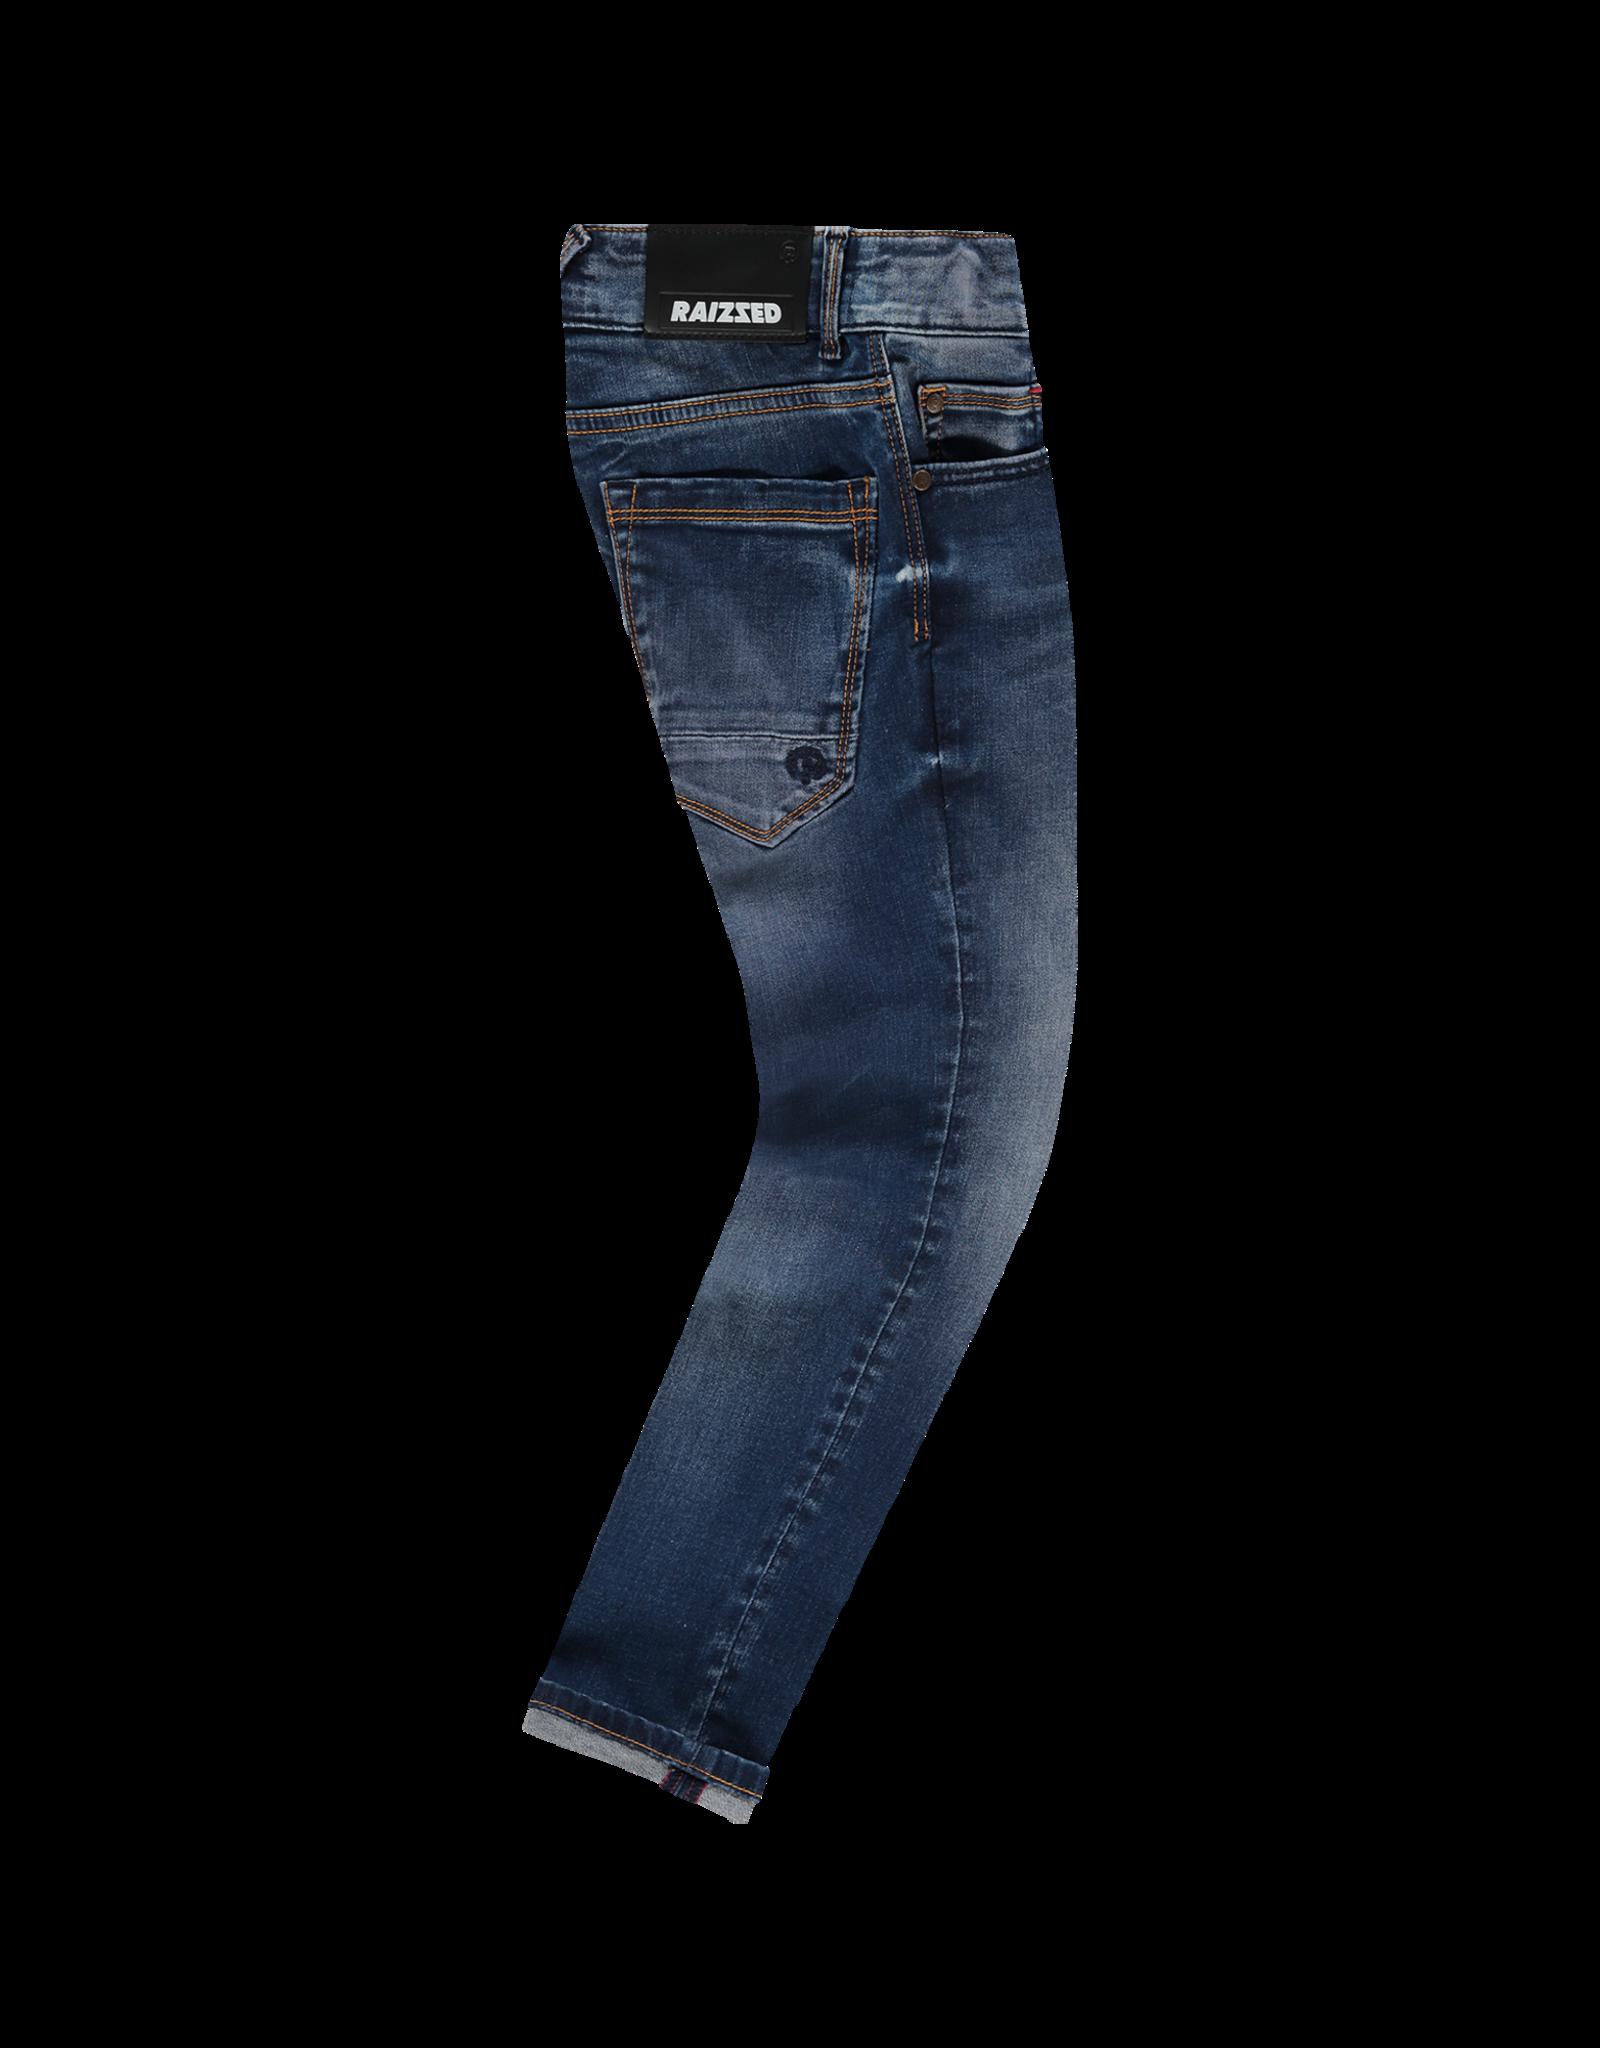 Raizzed Jeans Tokyo Dark Blue Tinted